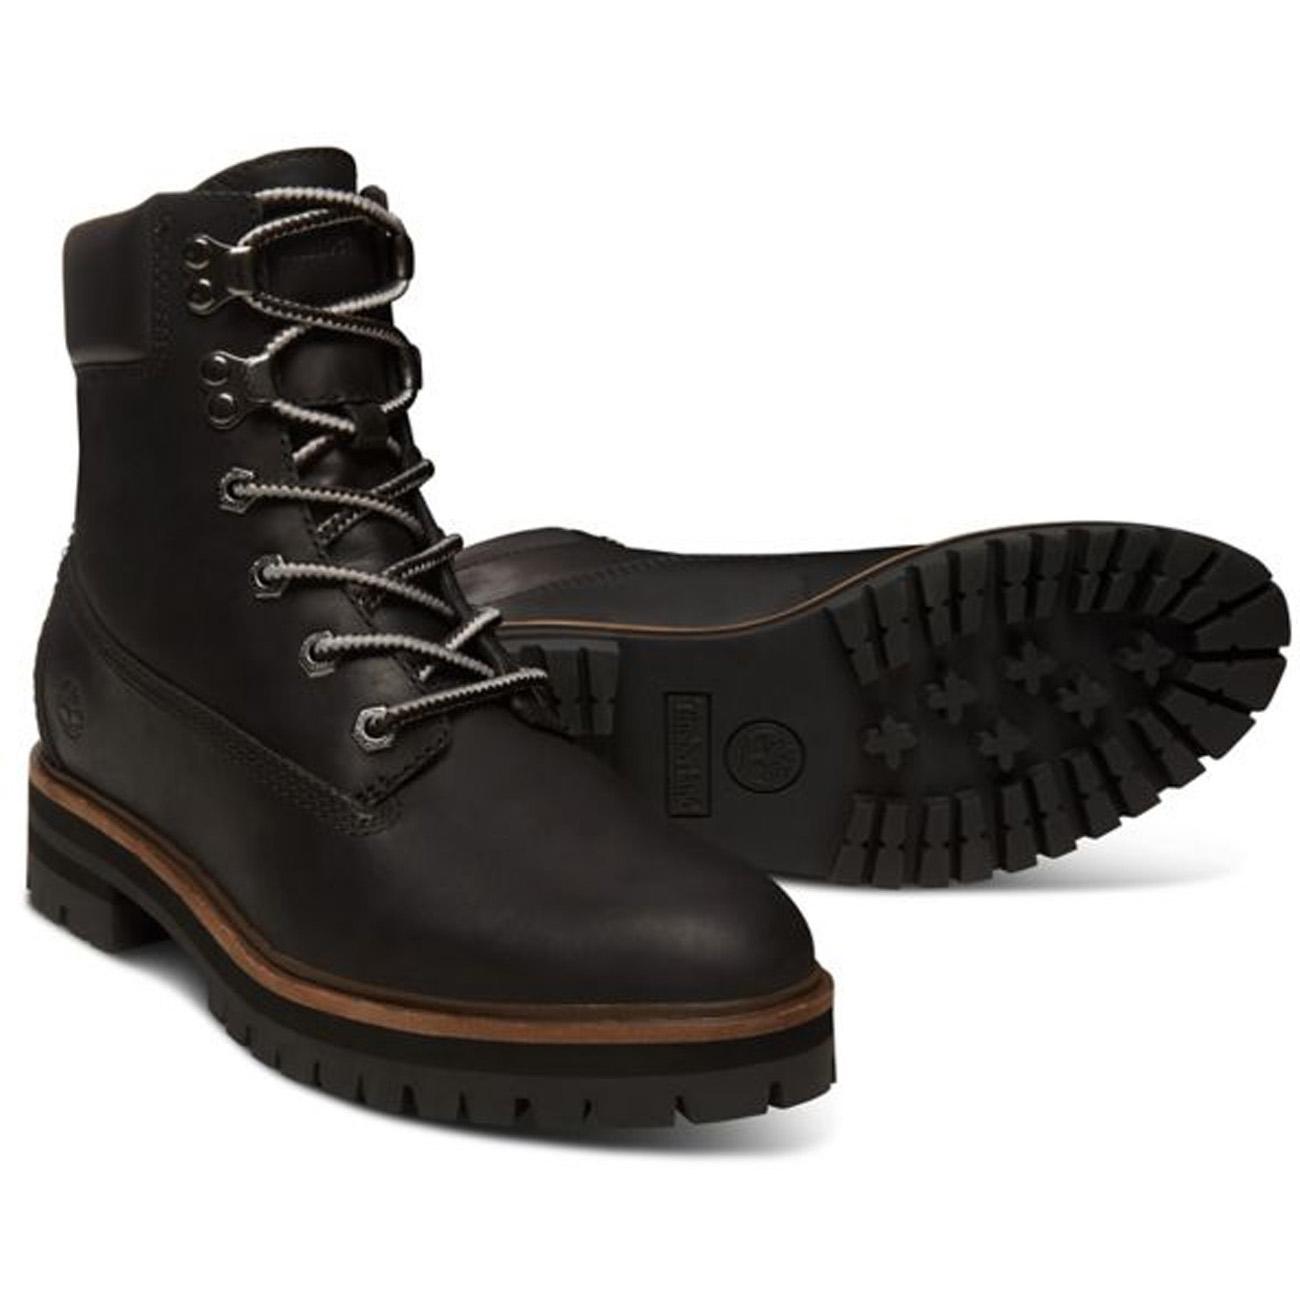 Timberland Damen Winterschuh London Square 6in Boot im Epoxy Shop